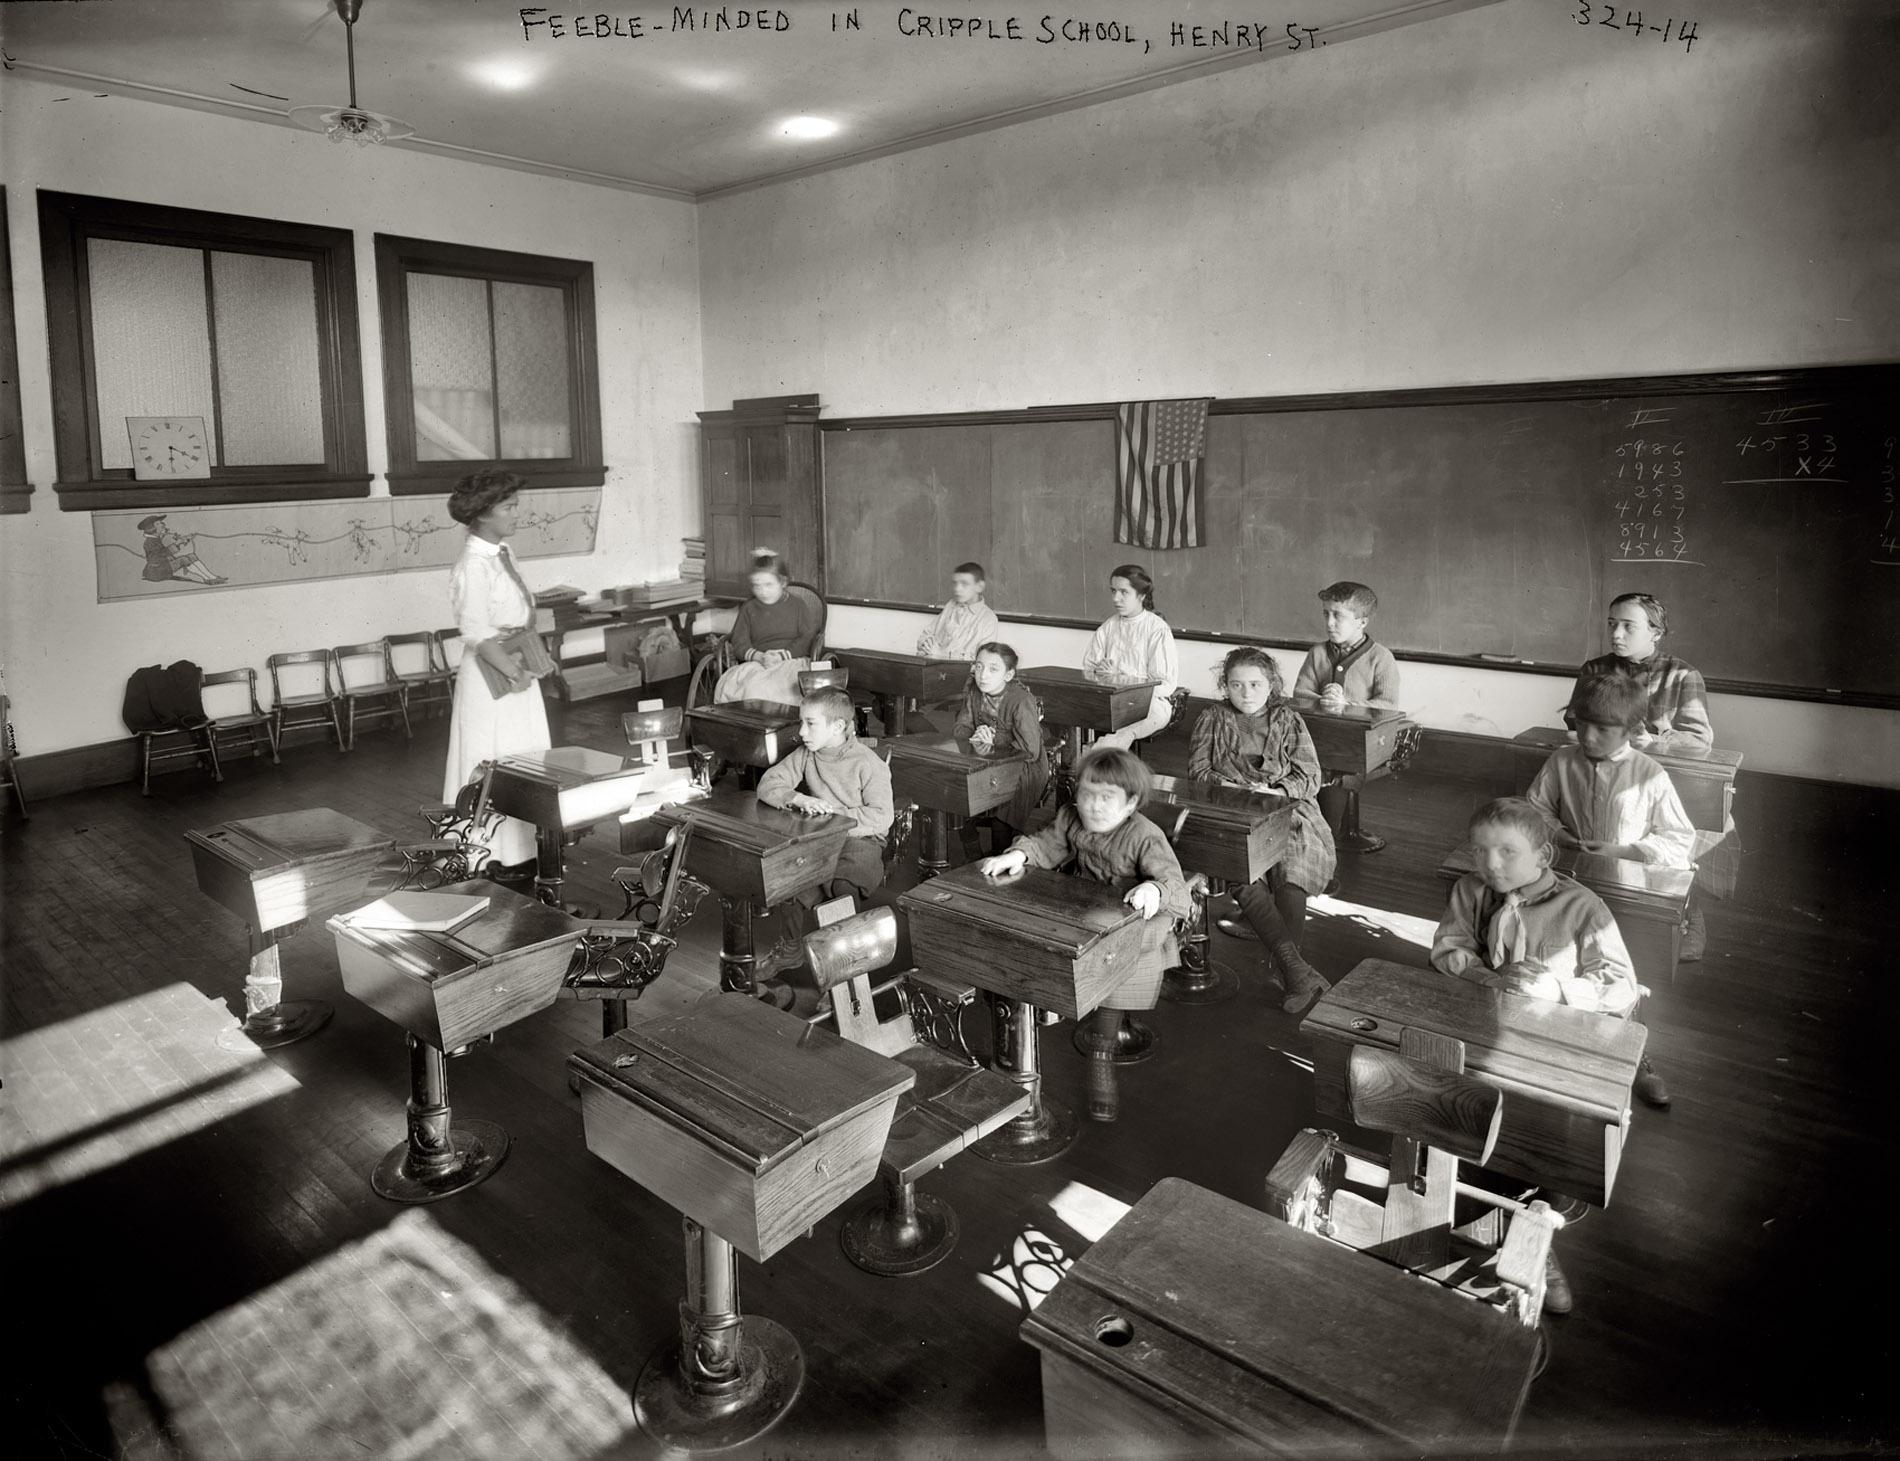 Shorpy Historic Picture Archive Cripple School